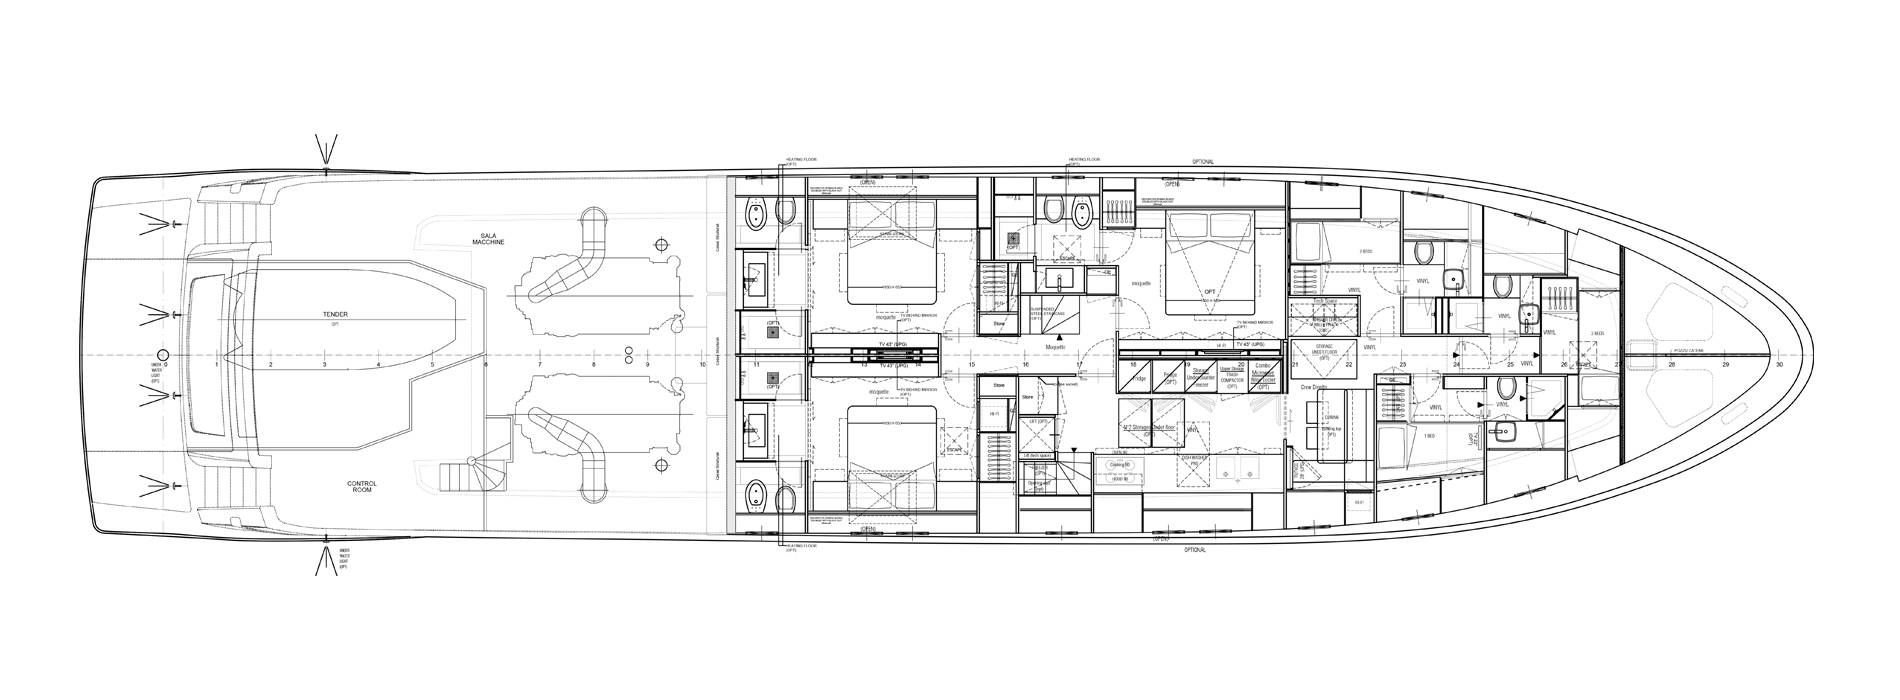 Sanlorenzo Yachts SL106-725 Нижняя палуба